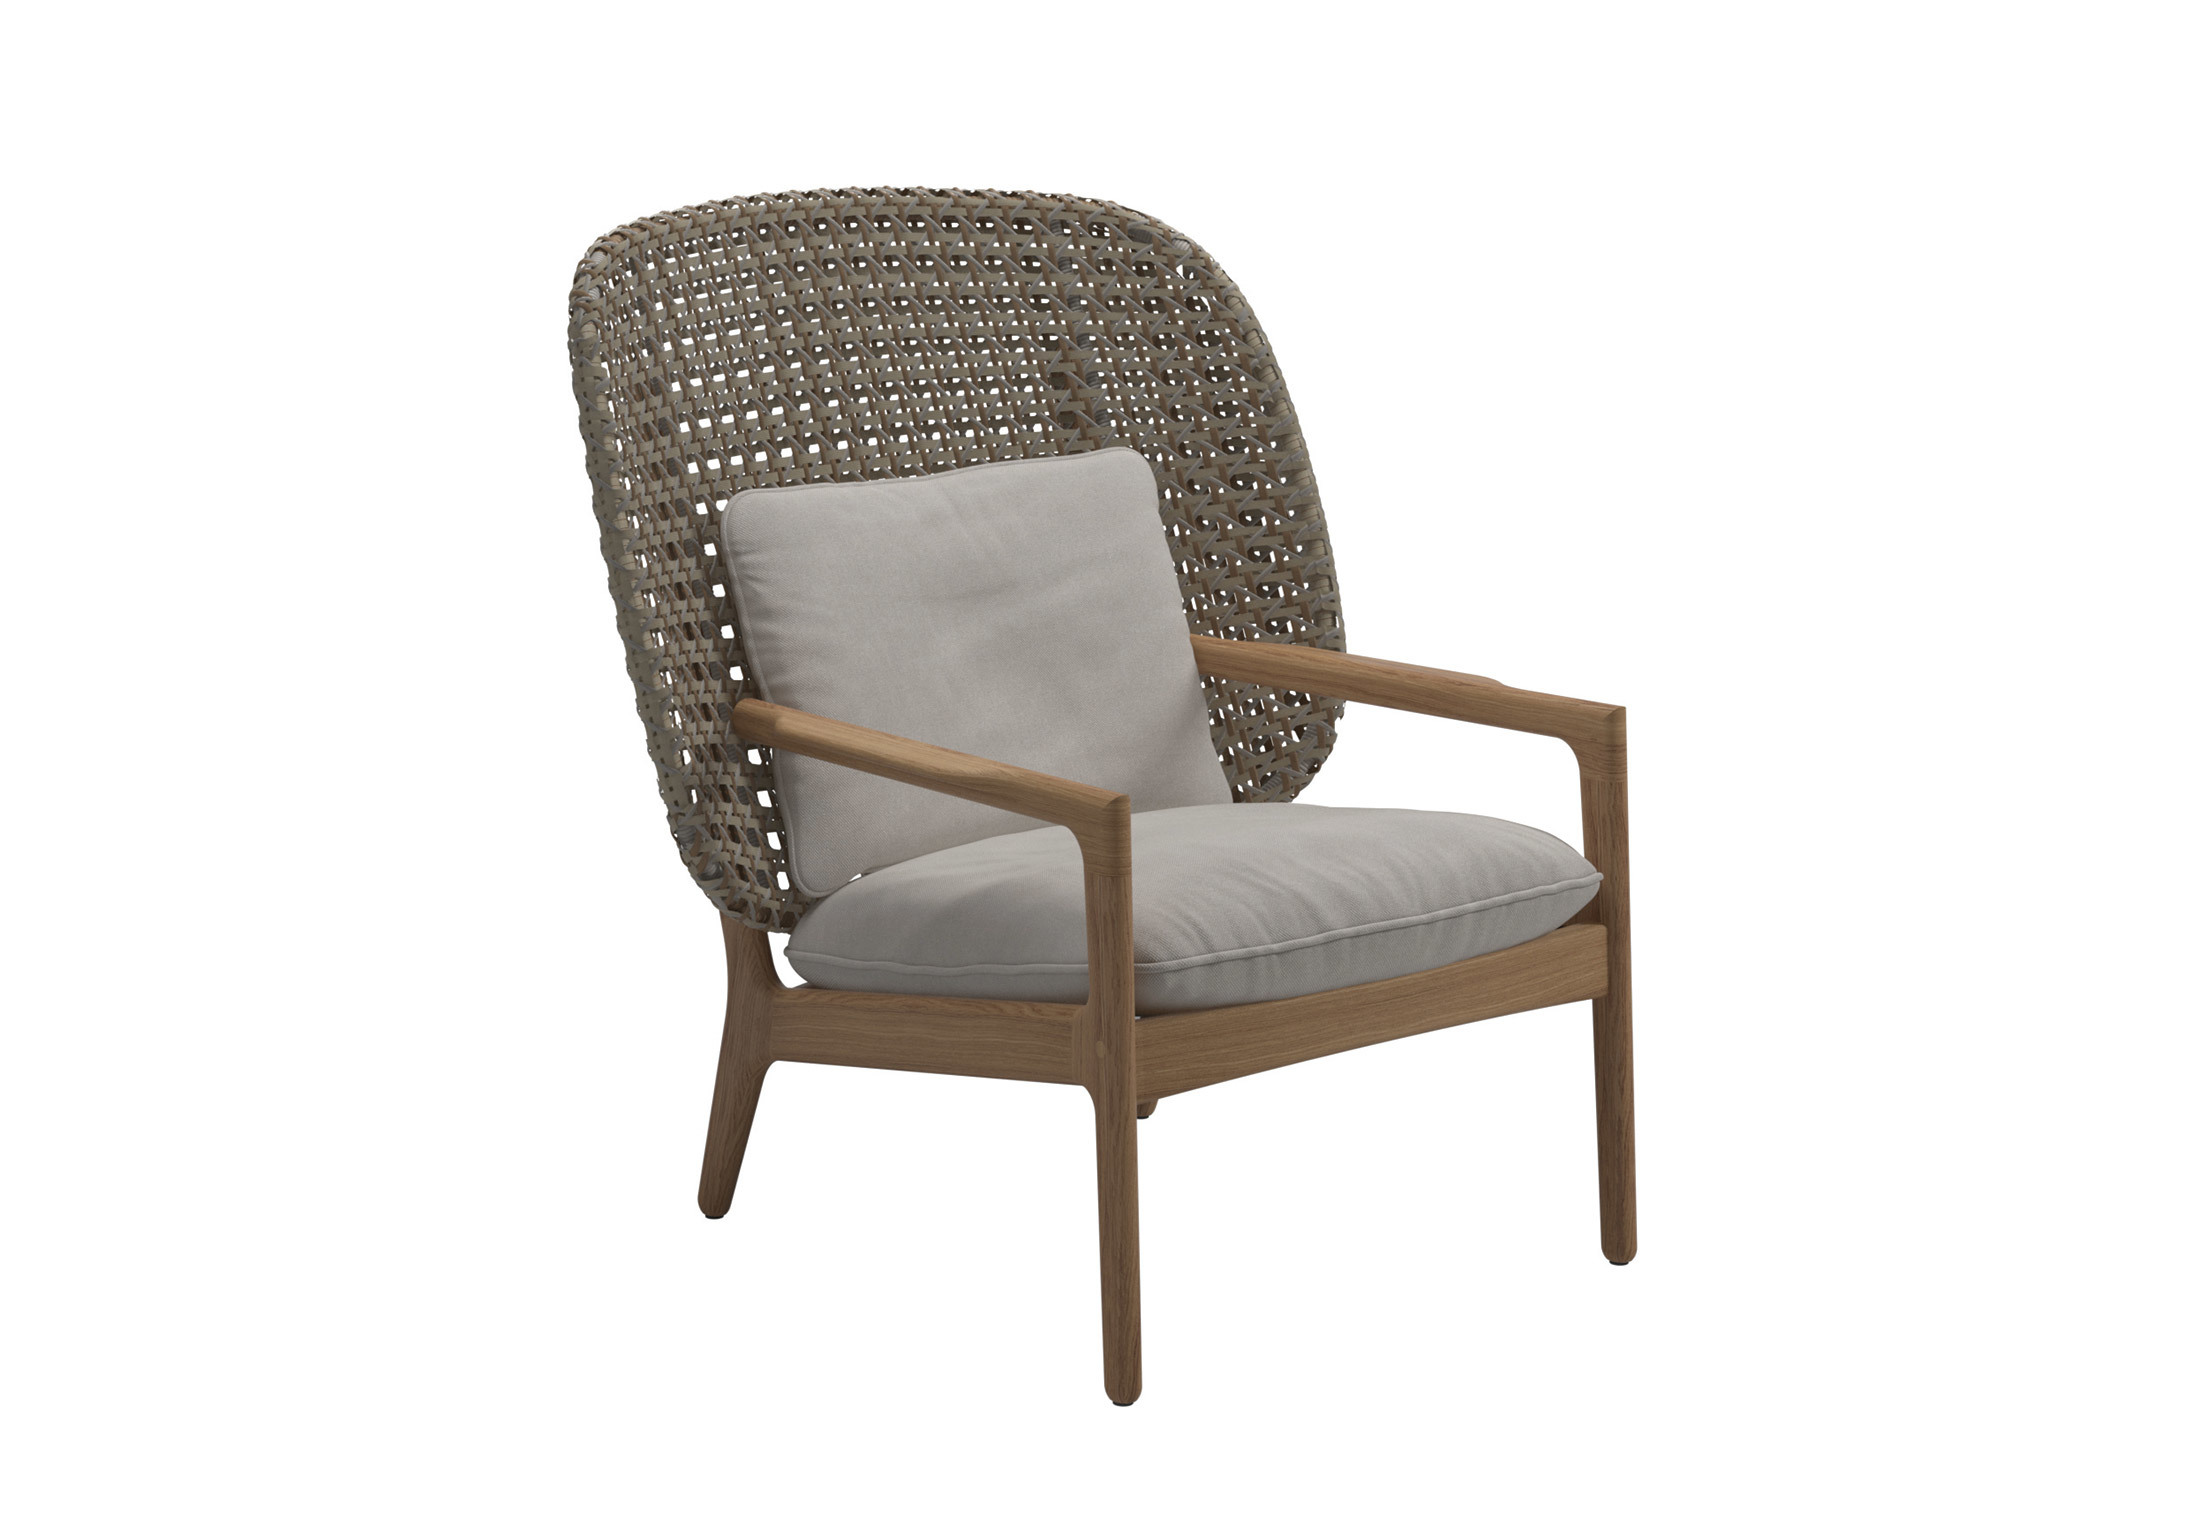 Kay high back lounge chair